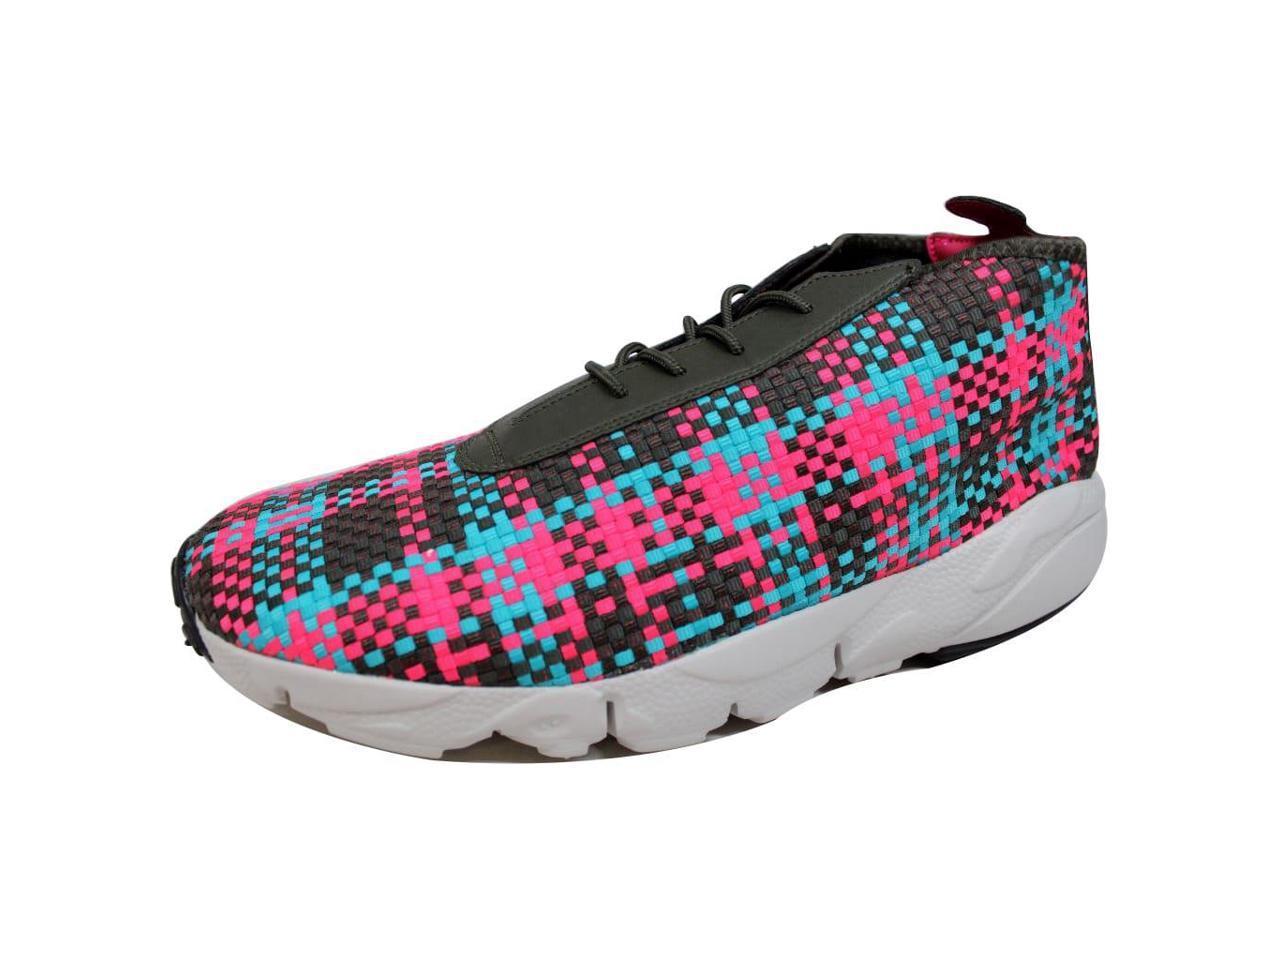 Nike Men's Air Footscape Desert Pink Chukka Cargo Khaki/Hyper Jade-Hyper Pink Desert 652822-300 Size 8.5 9e9b00